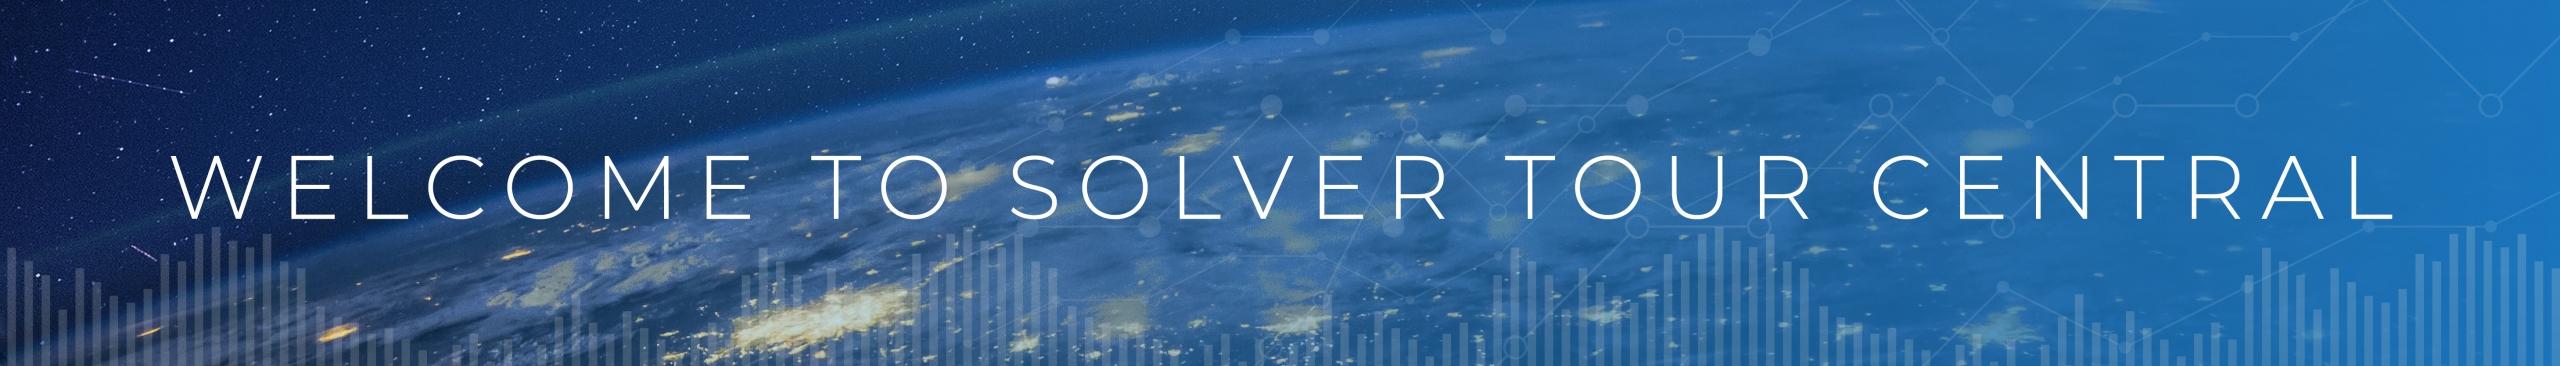 Solver Tour Central Banner